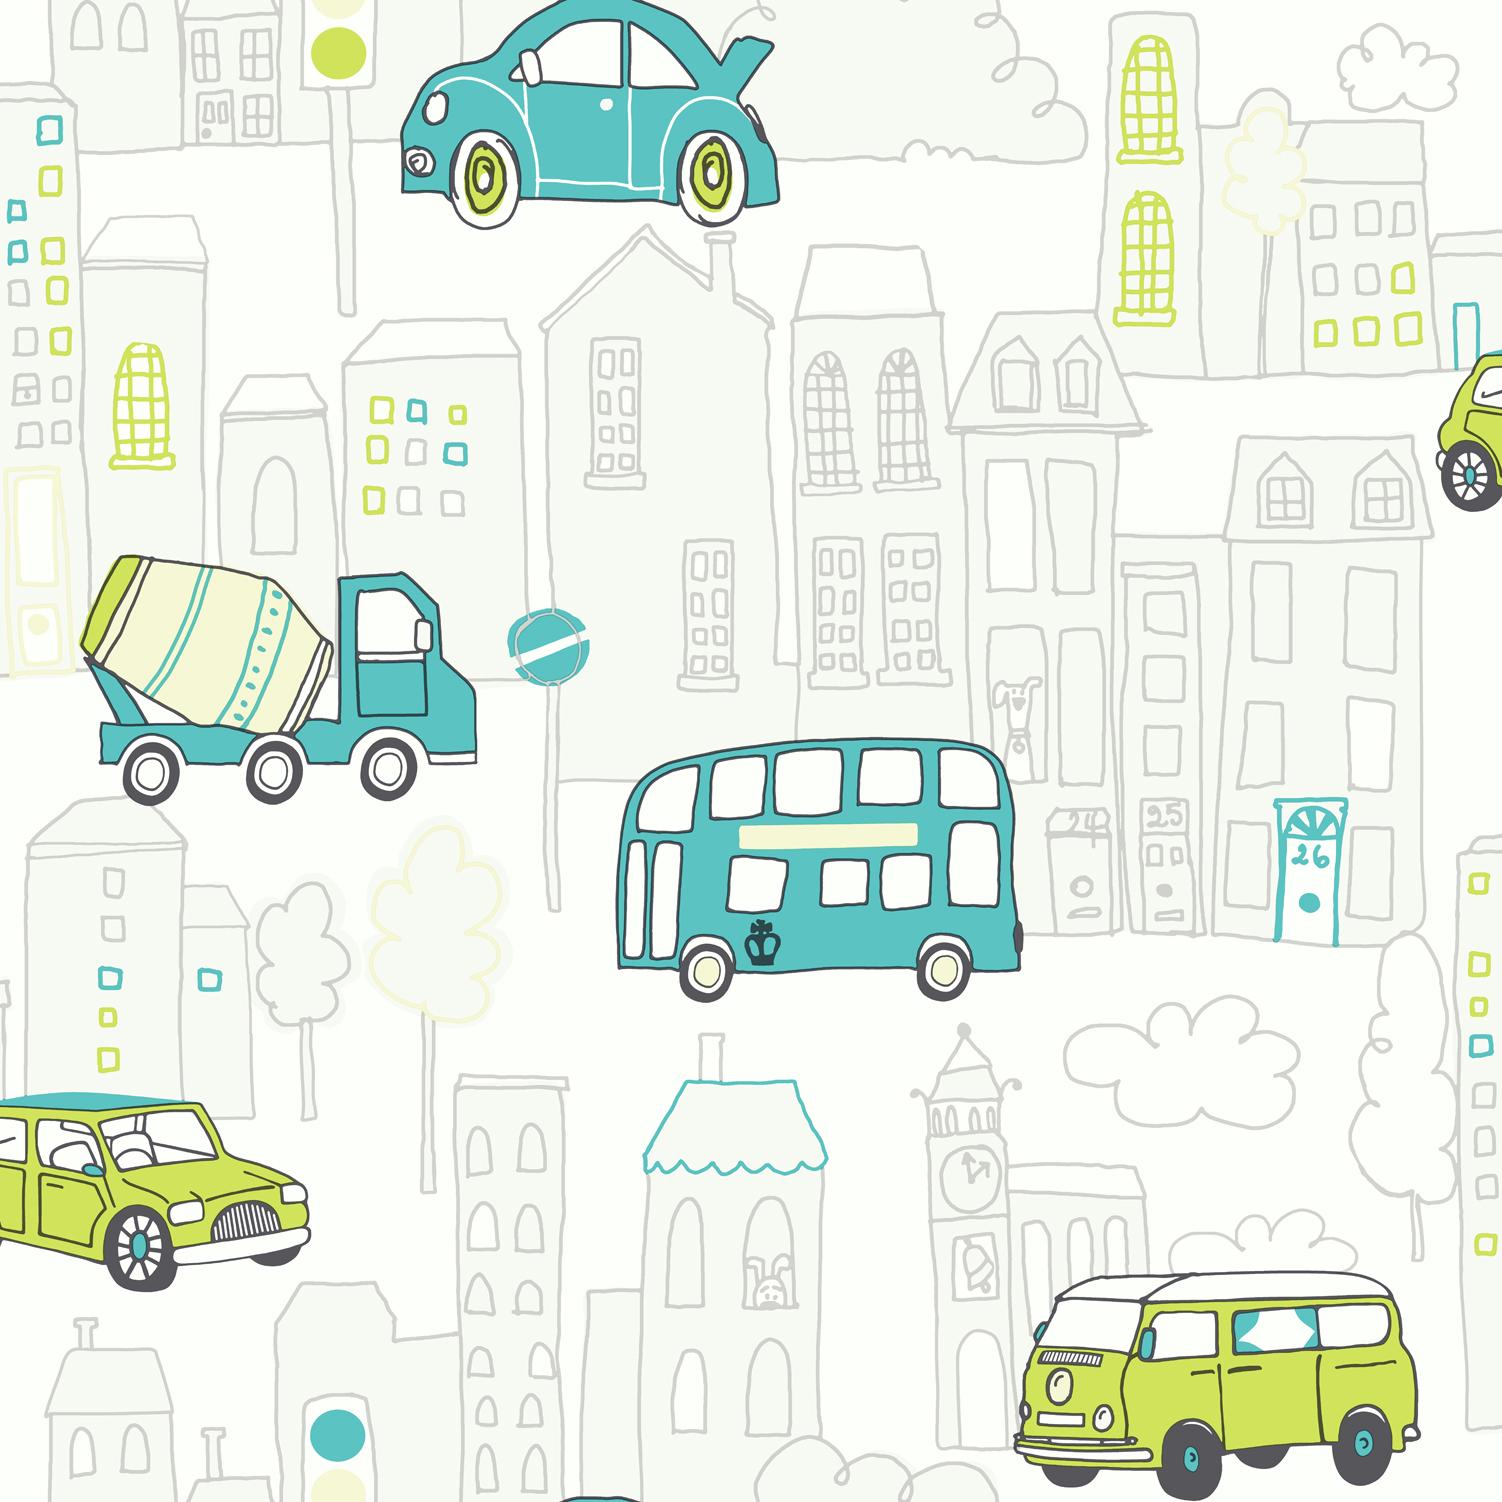 Tapeta Pojazdy Samochody 533503 Arthouse Opera Fun 7165238211